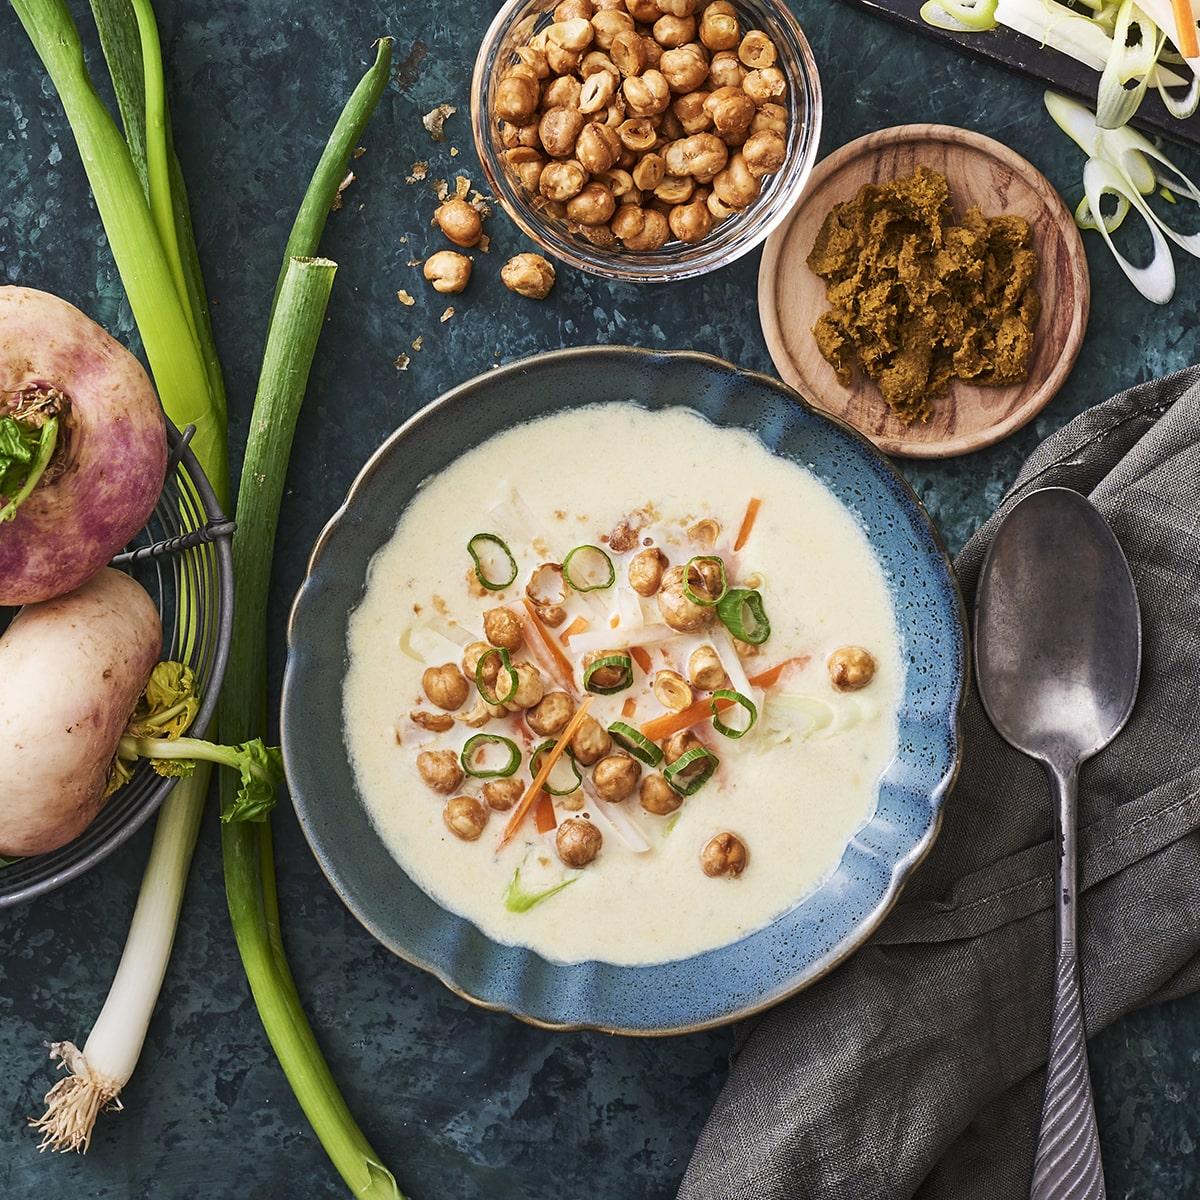 Green curry suppe med majroe, springlog, gulerodder og kikaerter